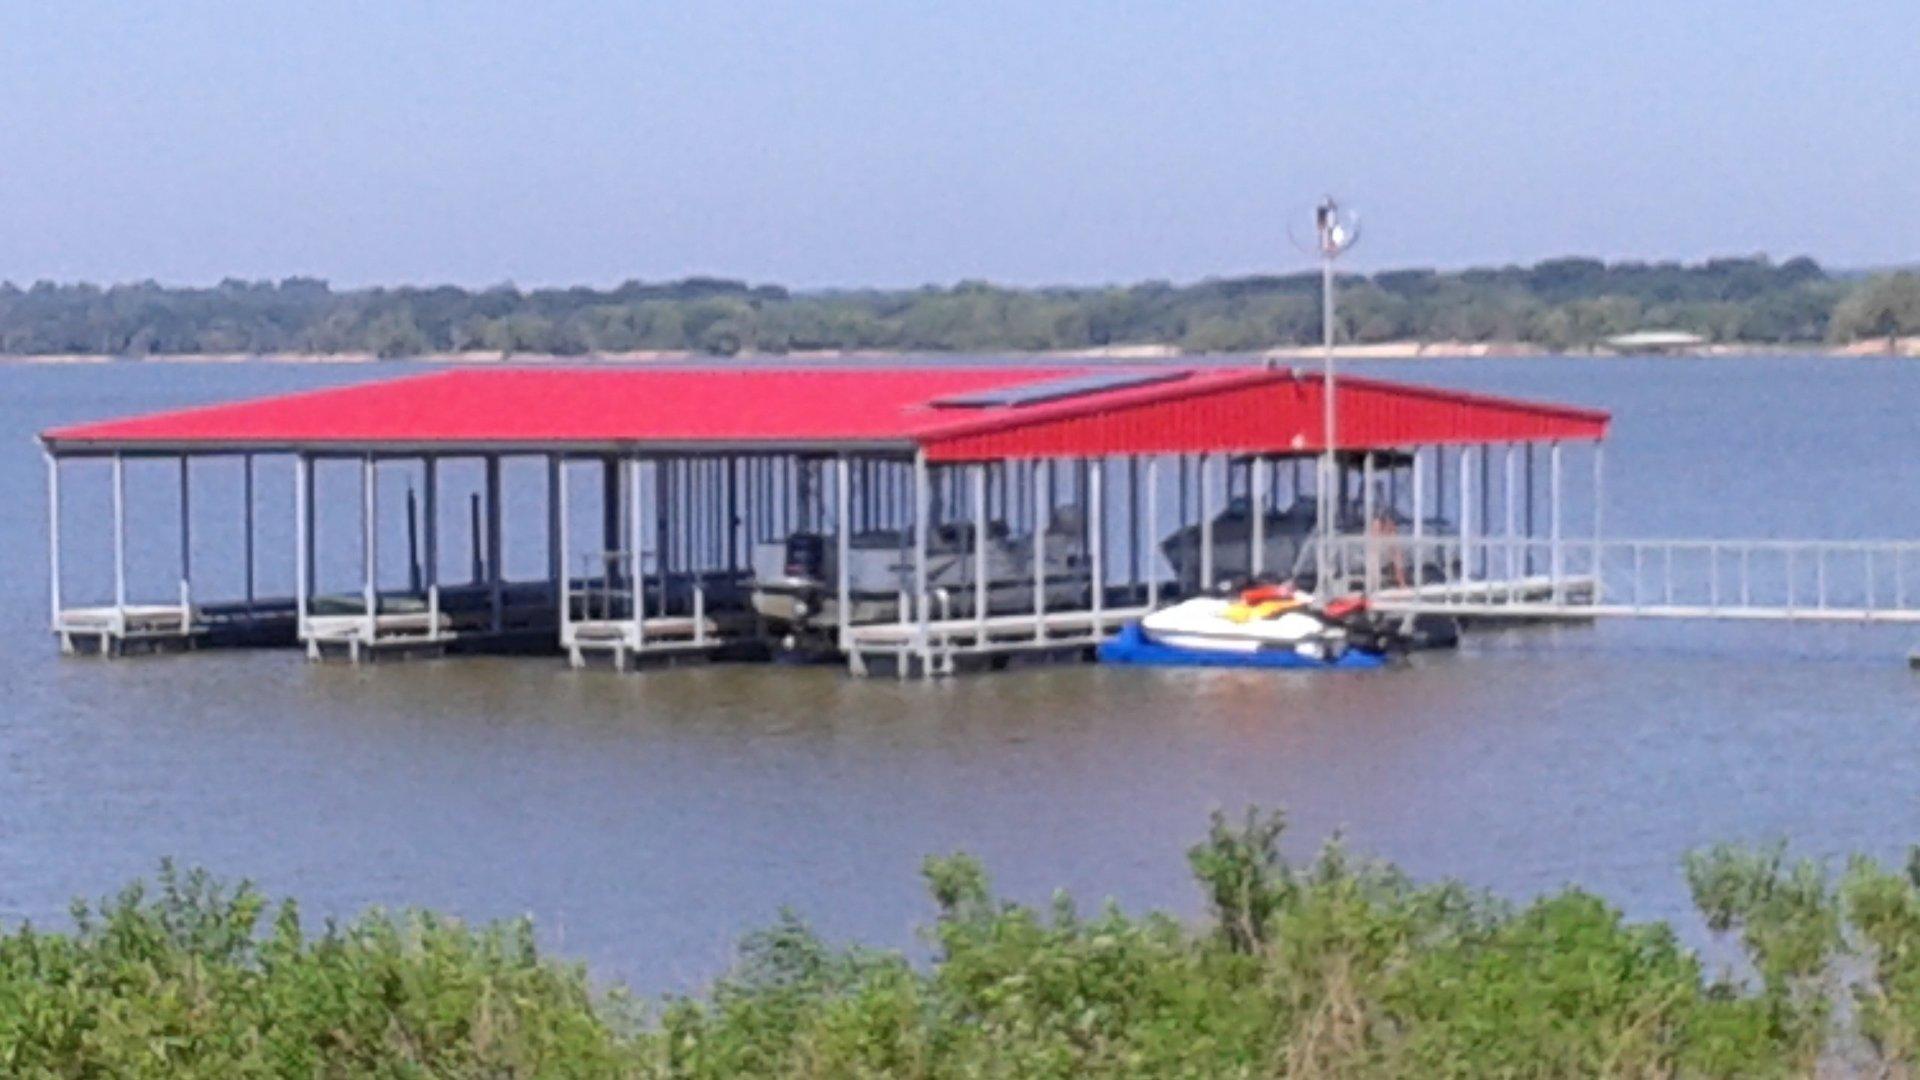 Hybrid Wind/Solar Powered Dock